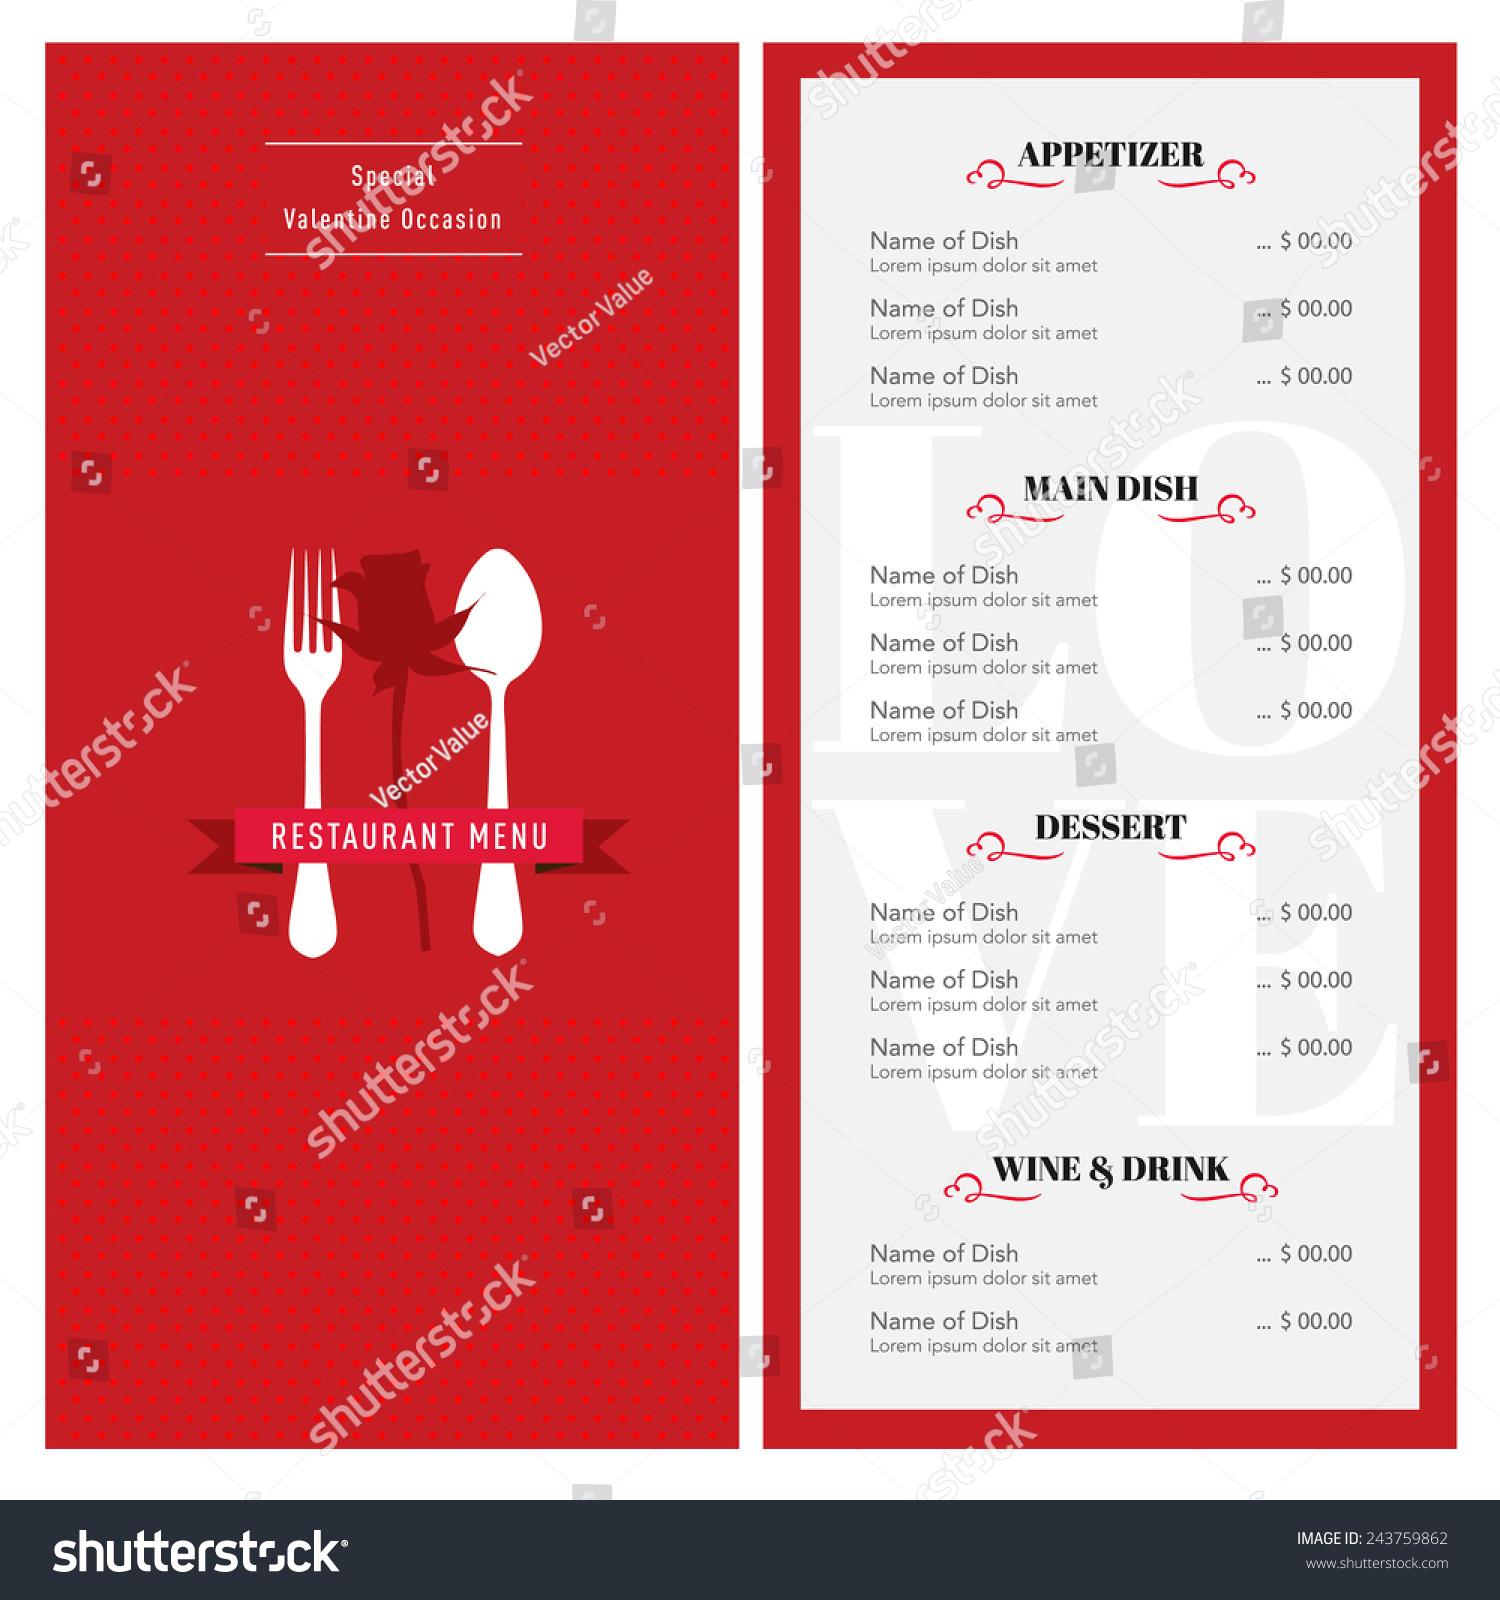 valentine menu design template cafe restaurant stock vector royalty